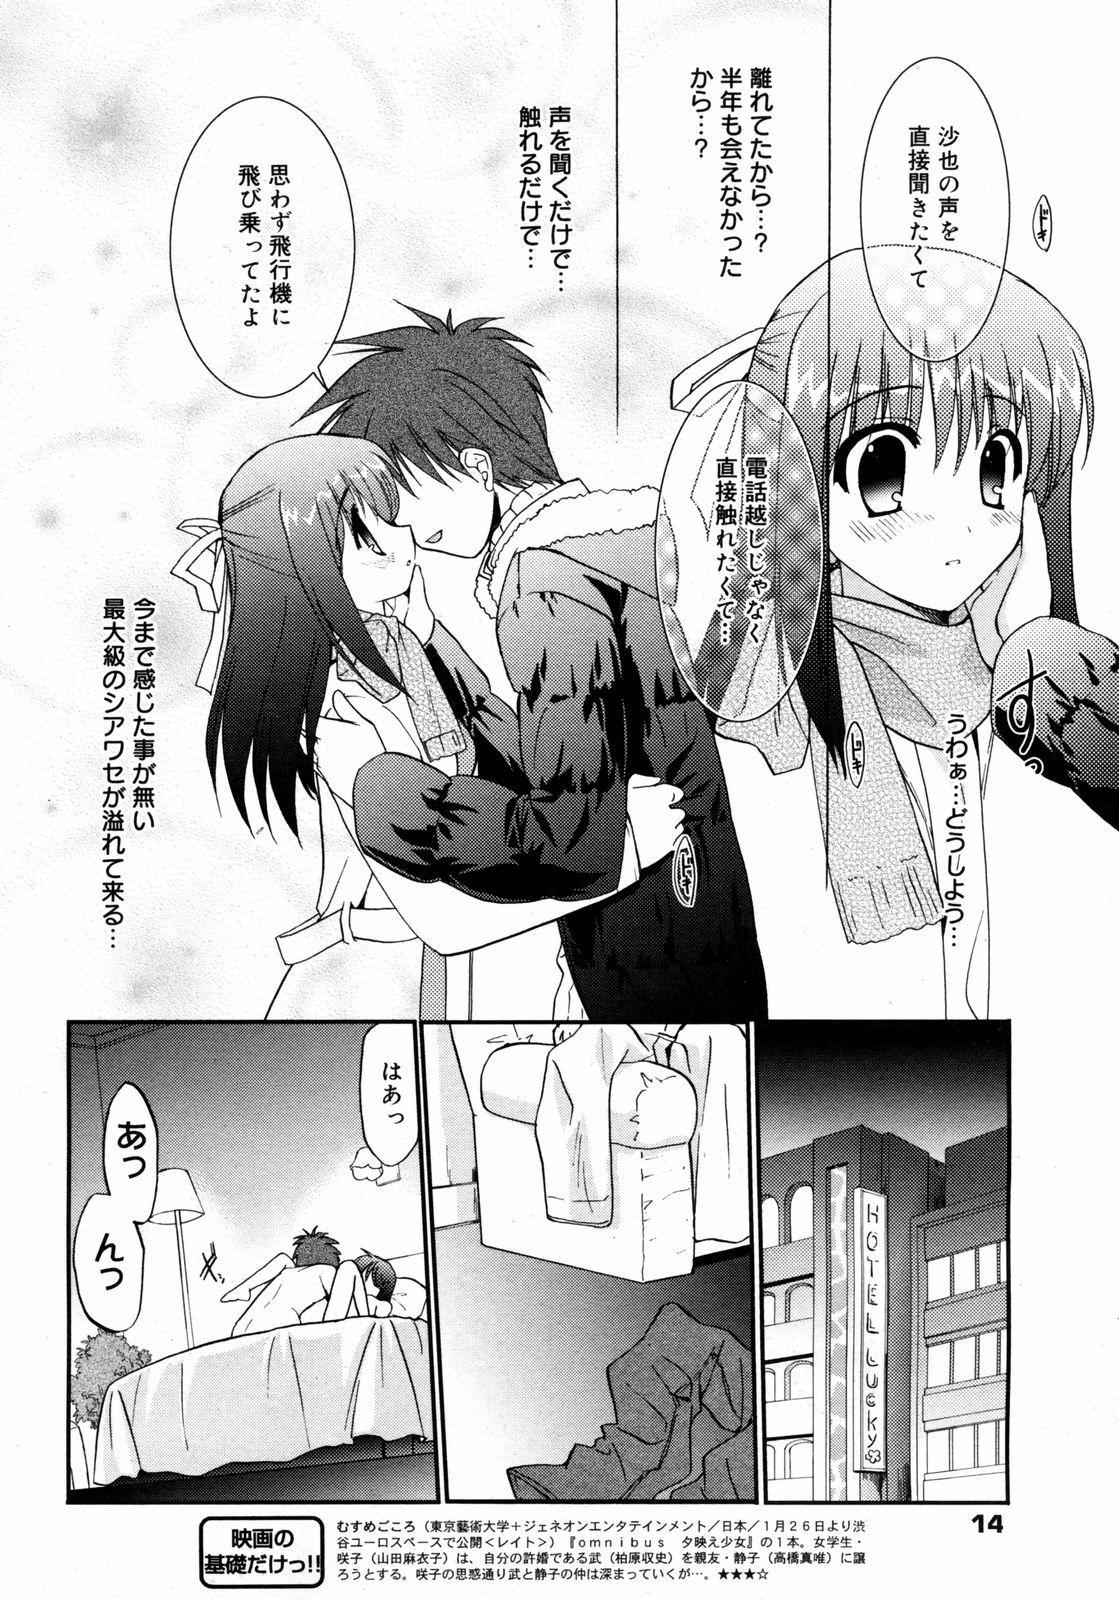 Manga Bangaichi 2008-03 13